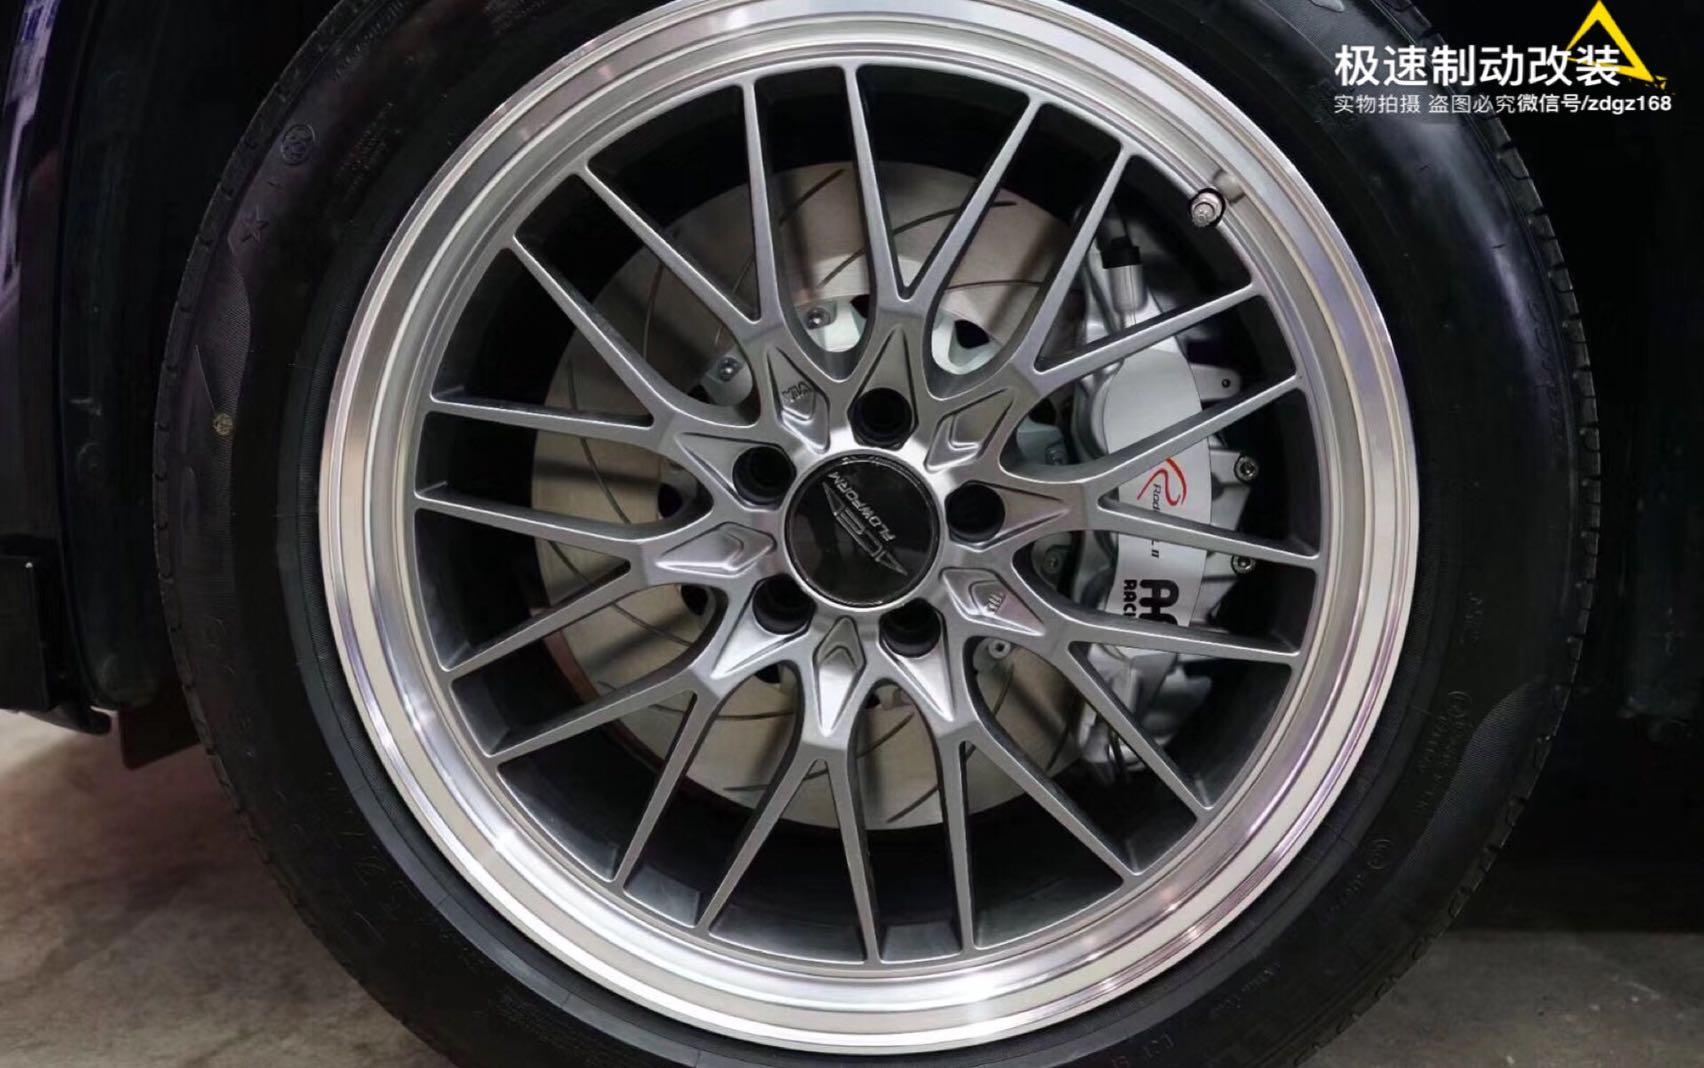 BMW宝马X3 G08刹车升级前Ap9560大六380碟盘,后370加大碟,完美上车!